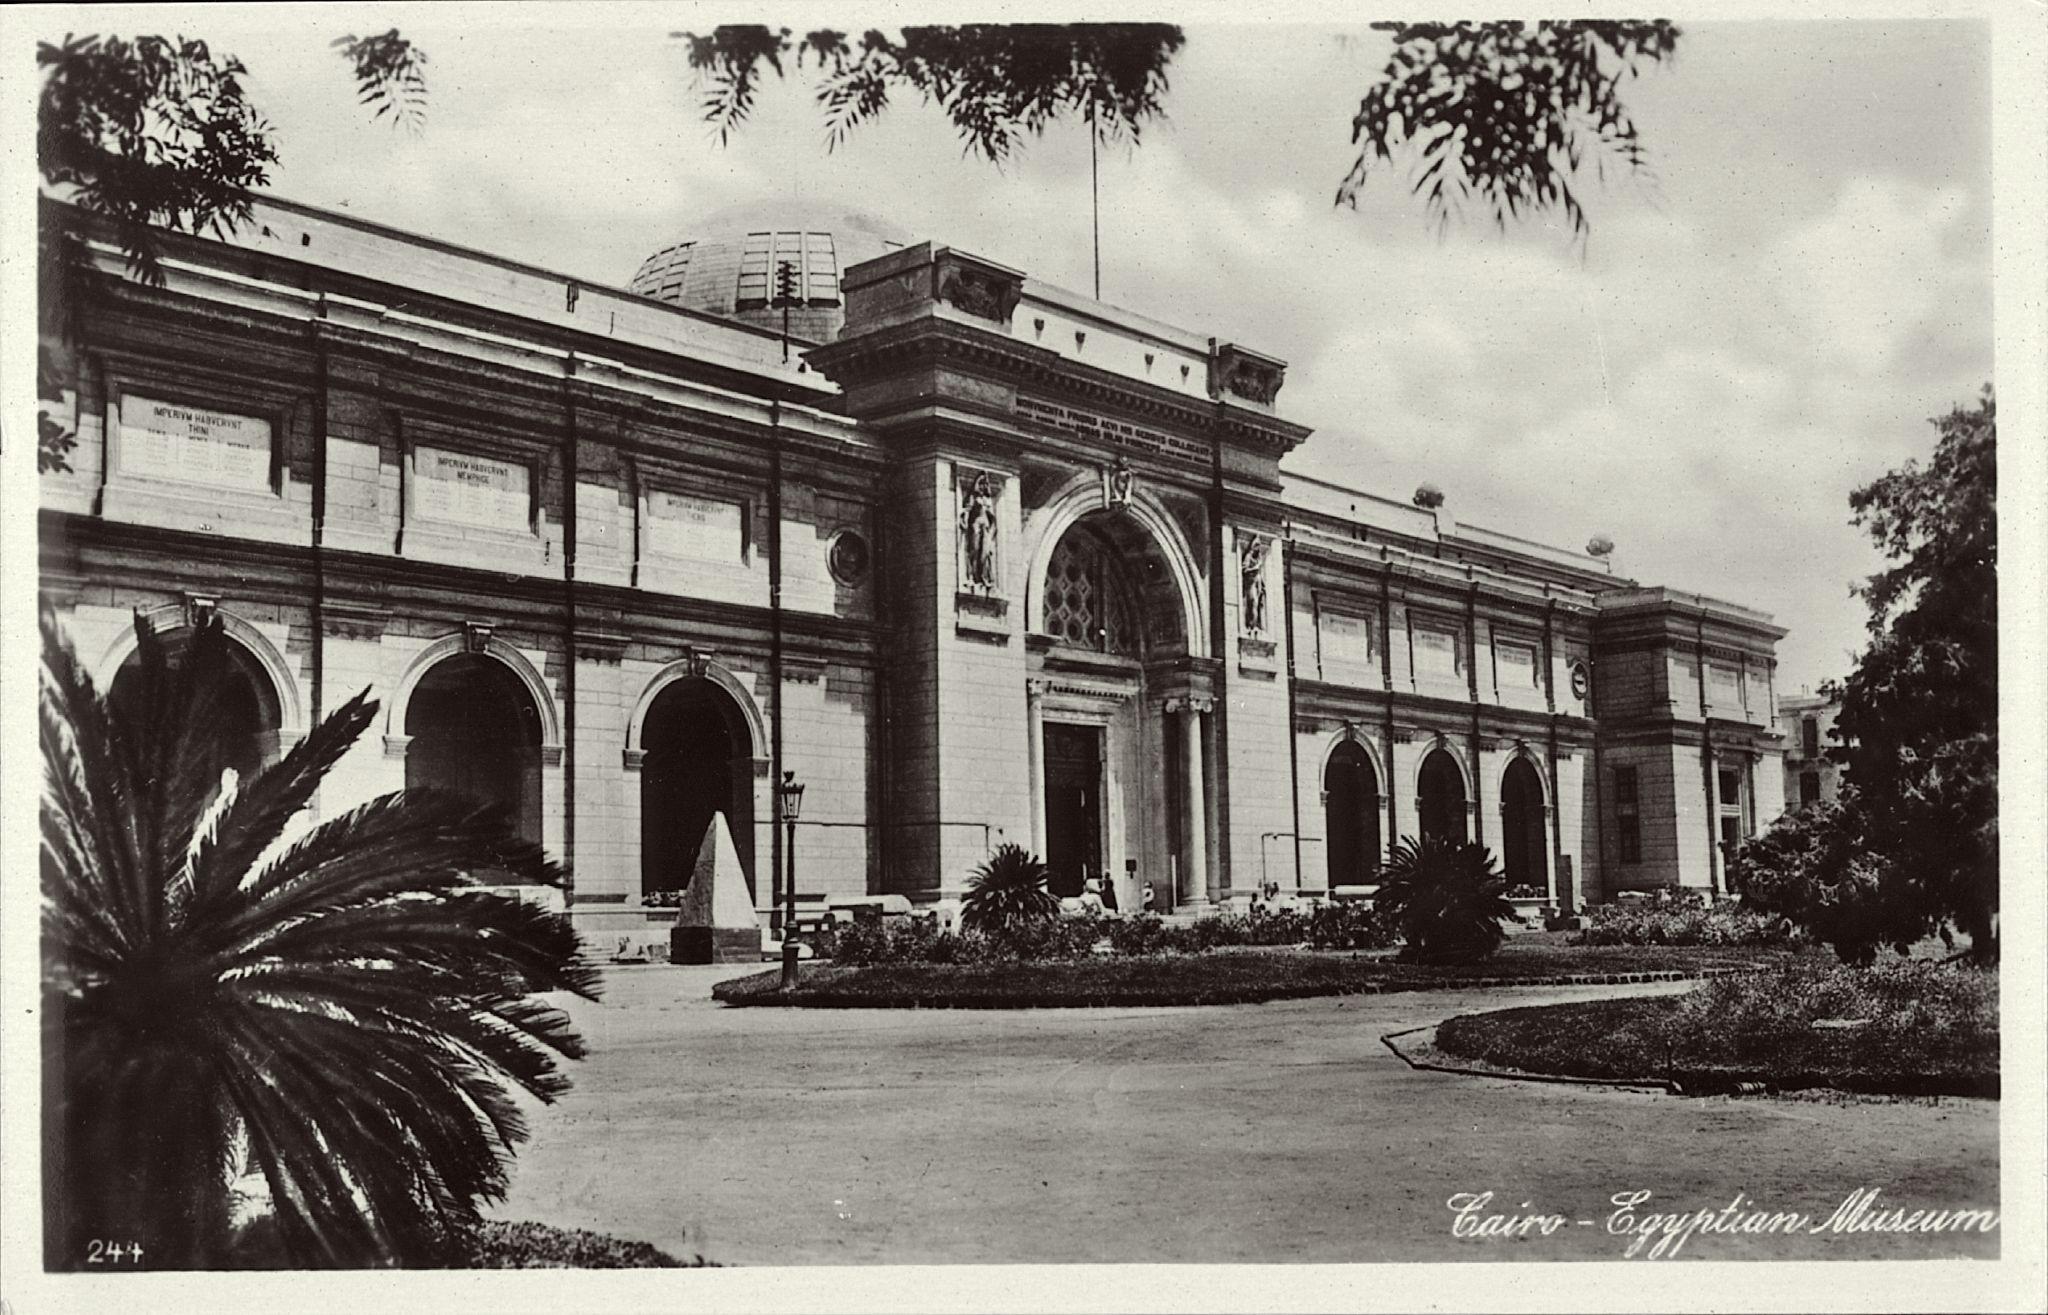 Каир. Египетский музей